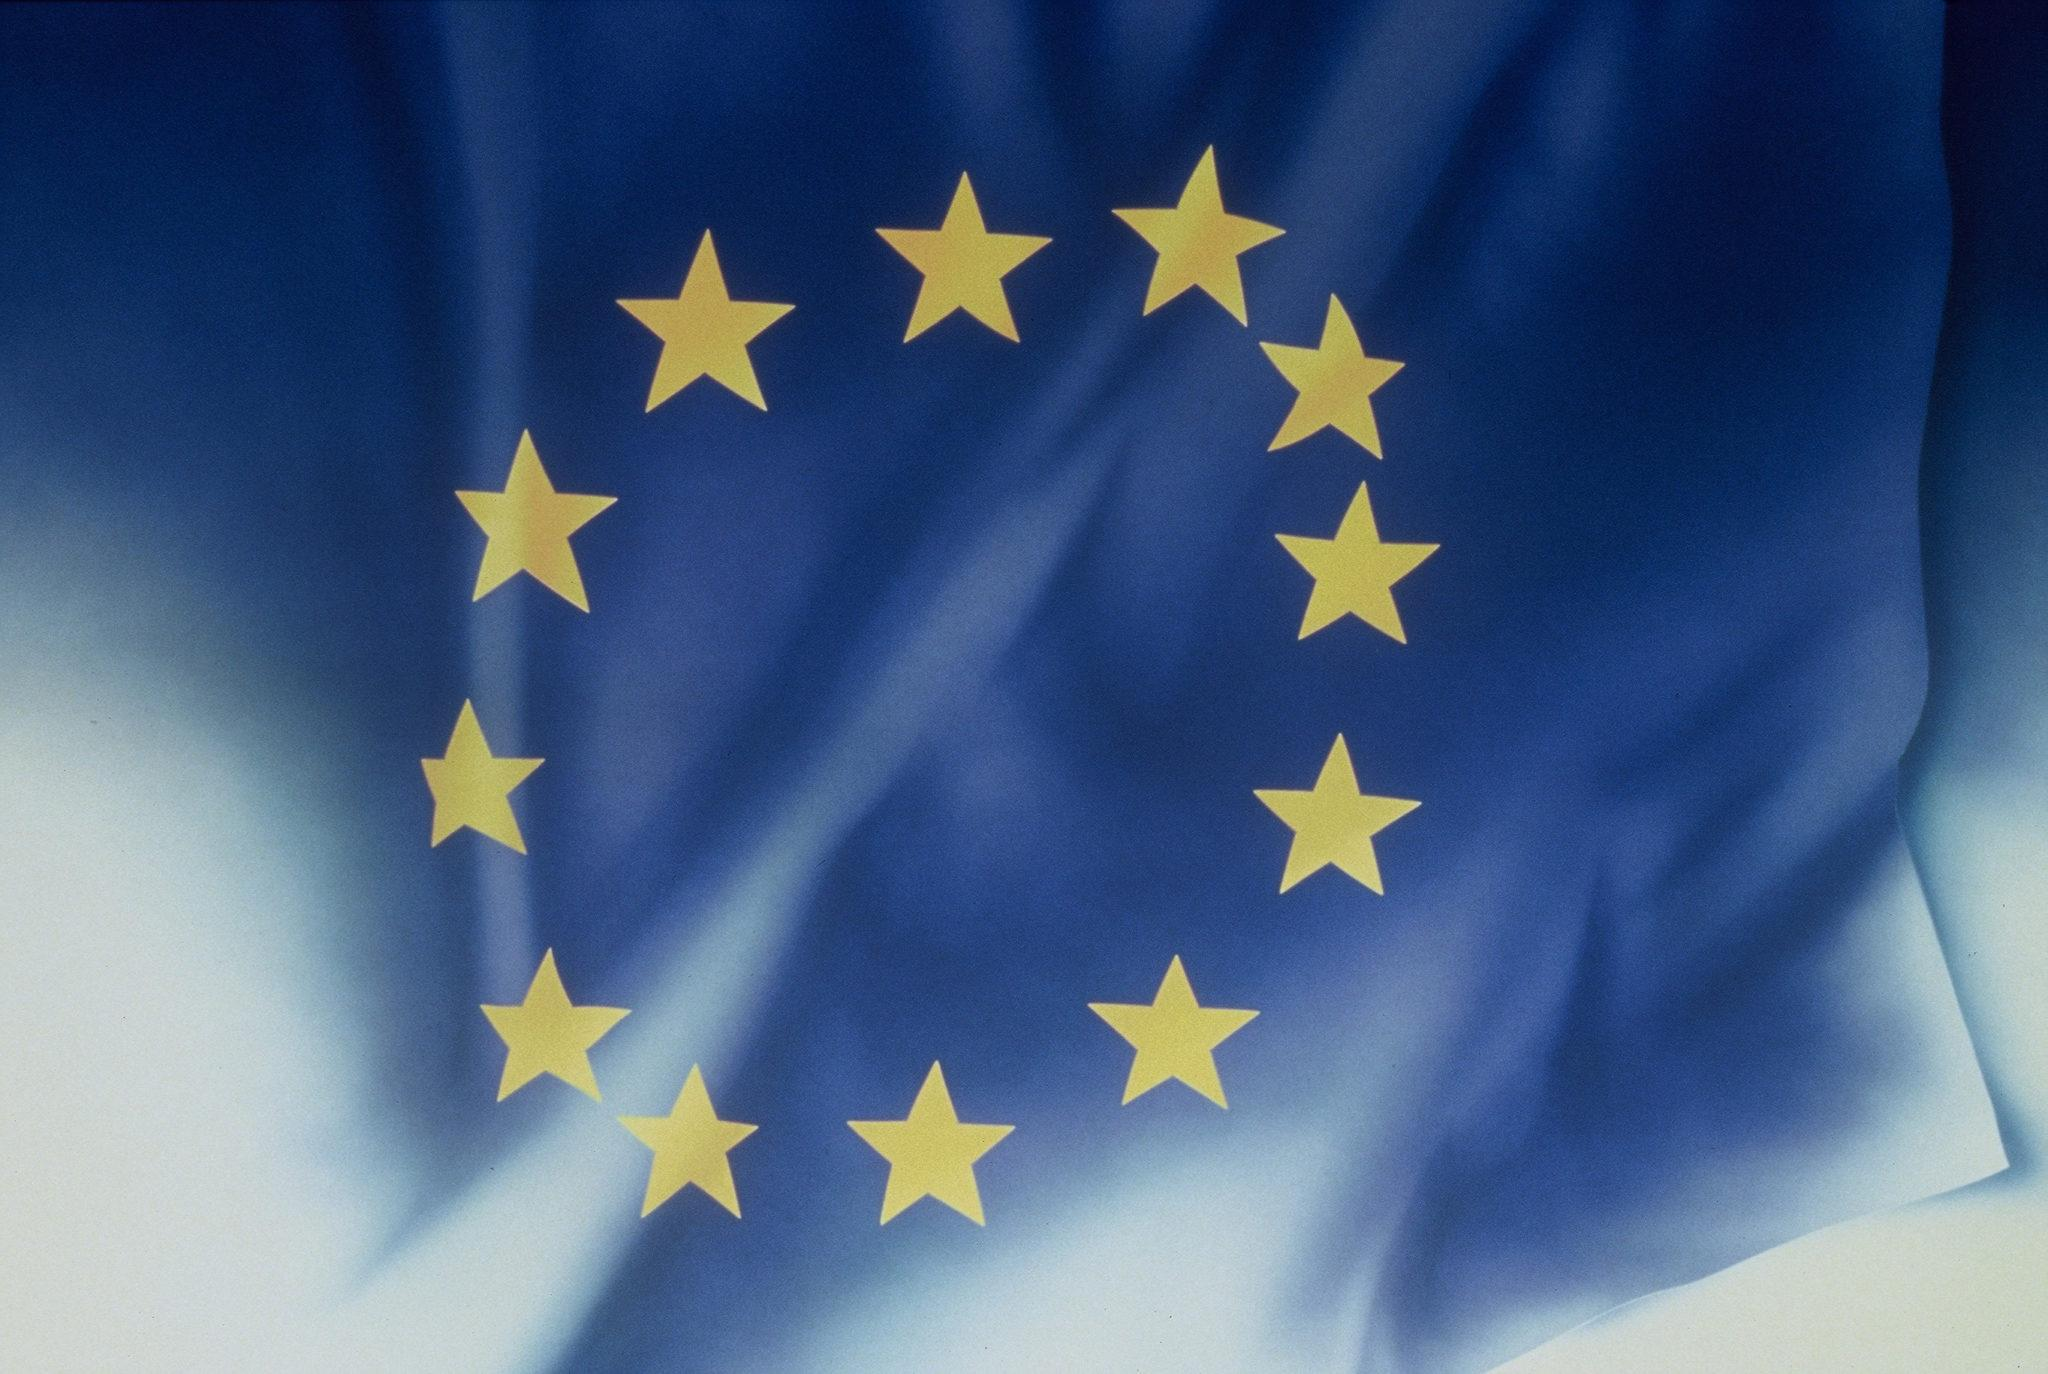 (c) EK Audivisual Services